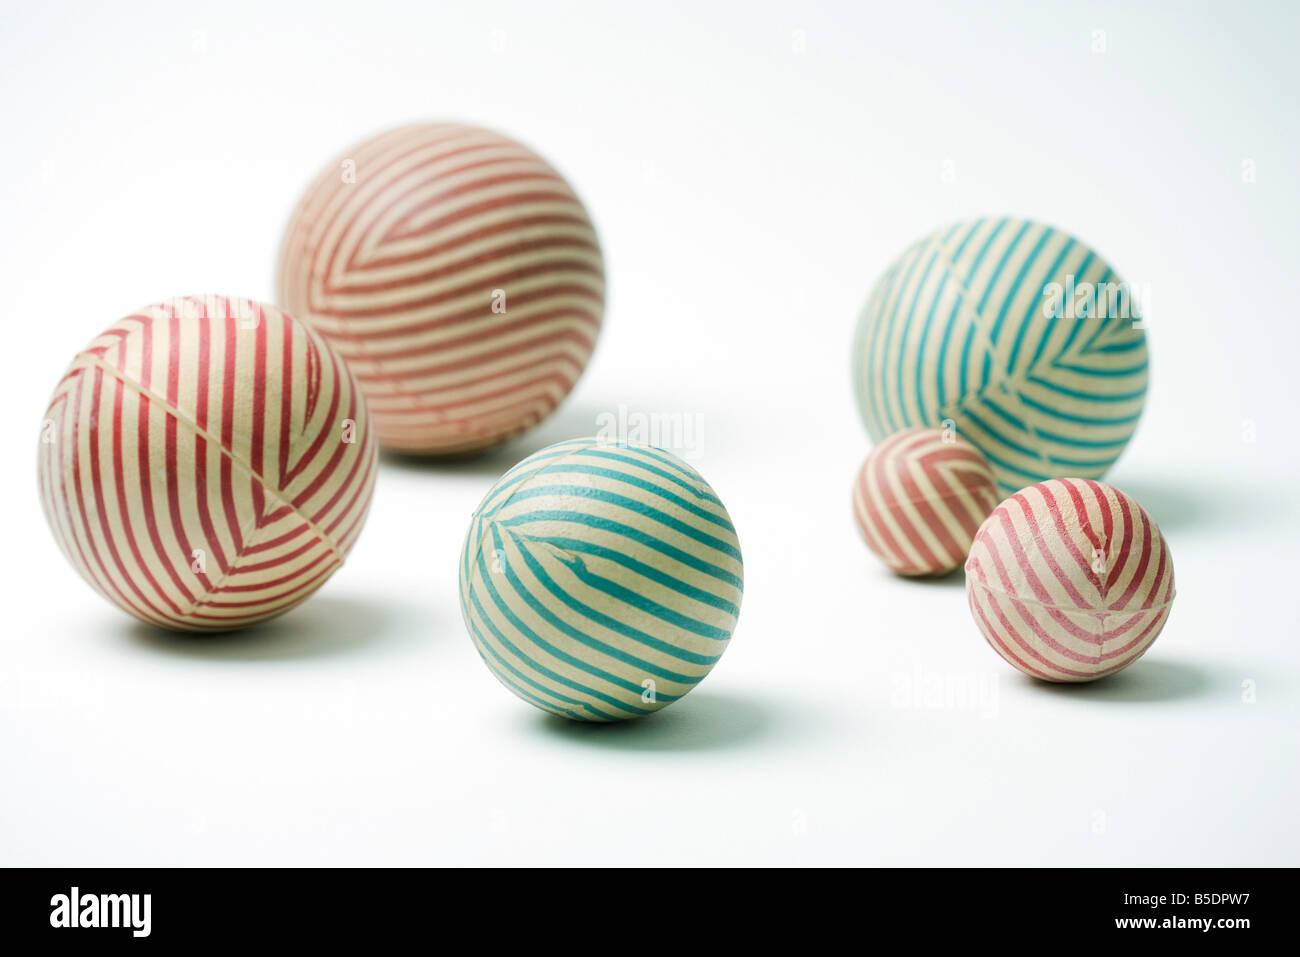 Striped rubber balls, still life - Stock Image